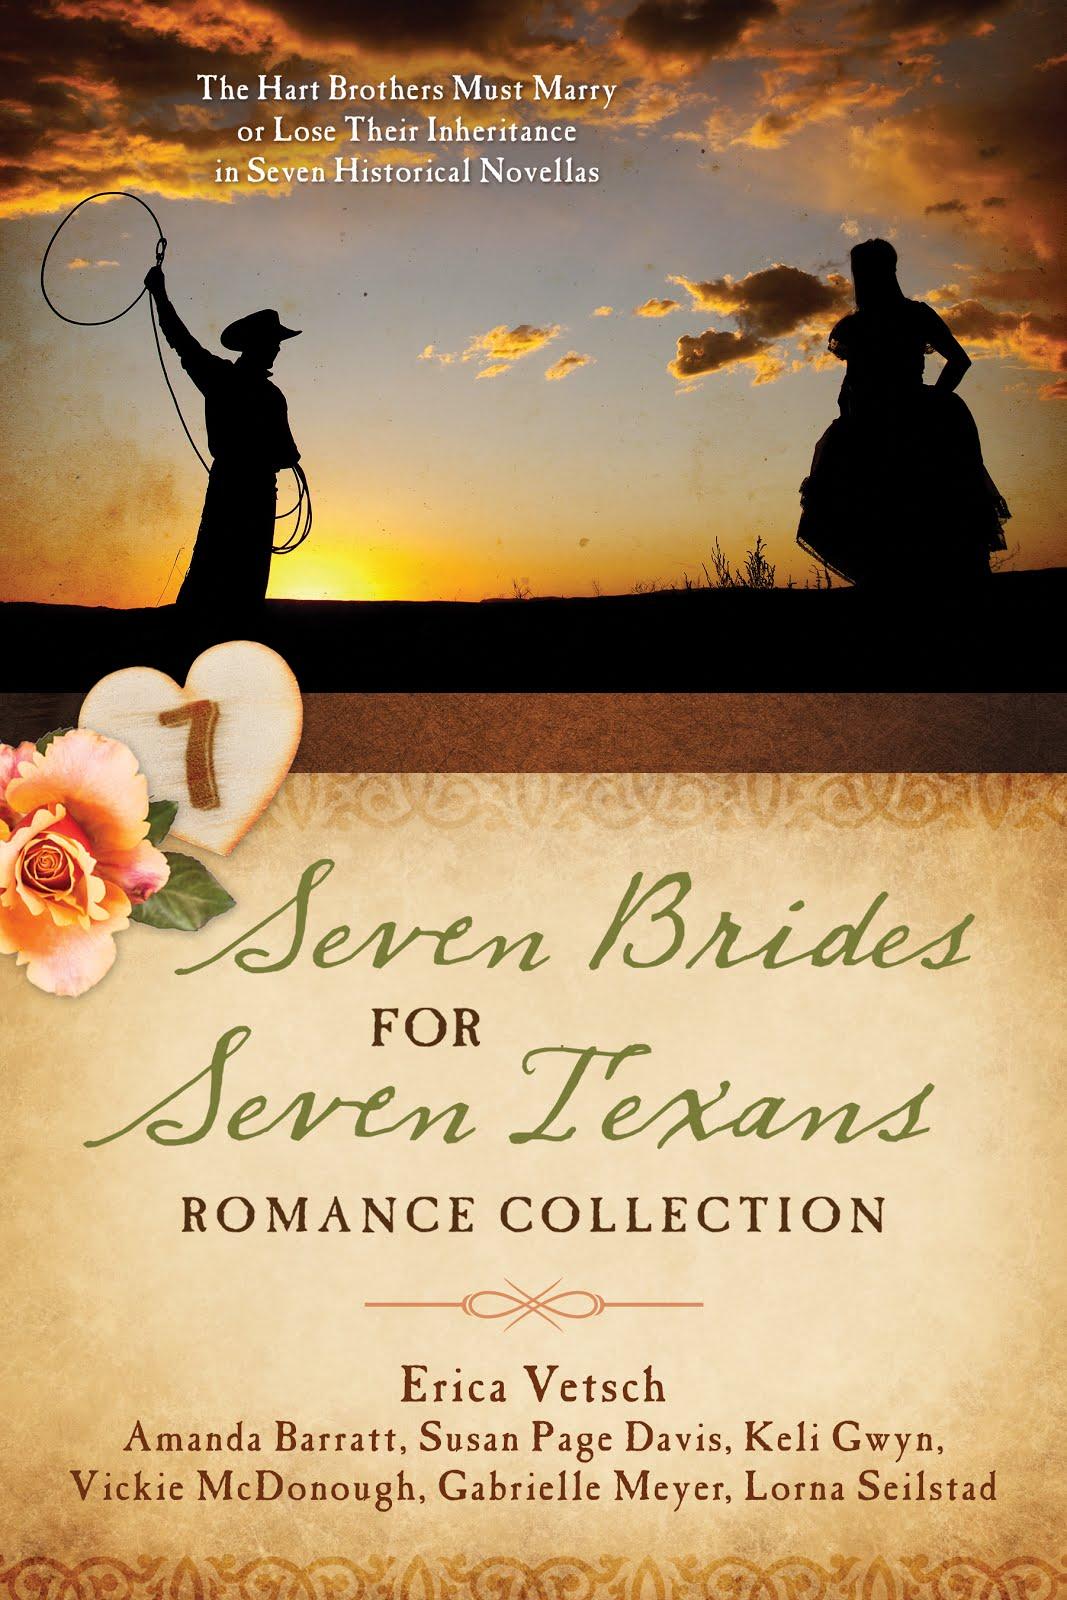 7 Brides for 7 Texans